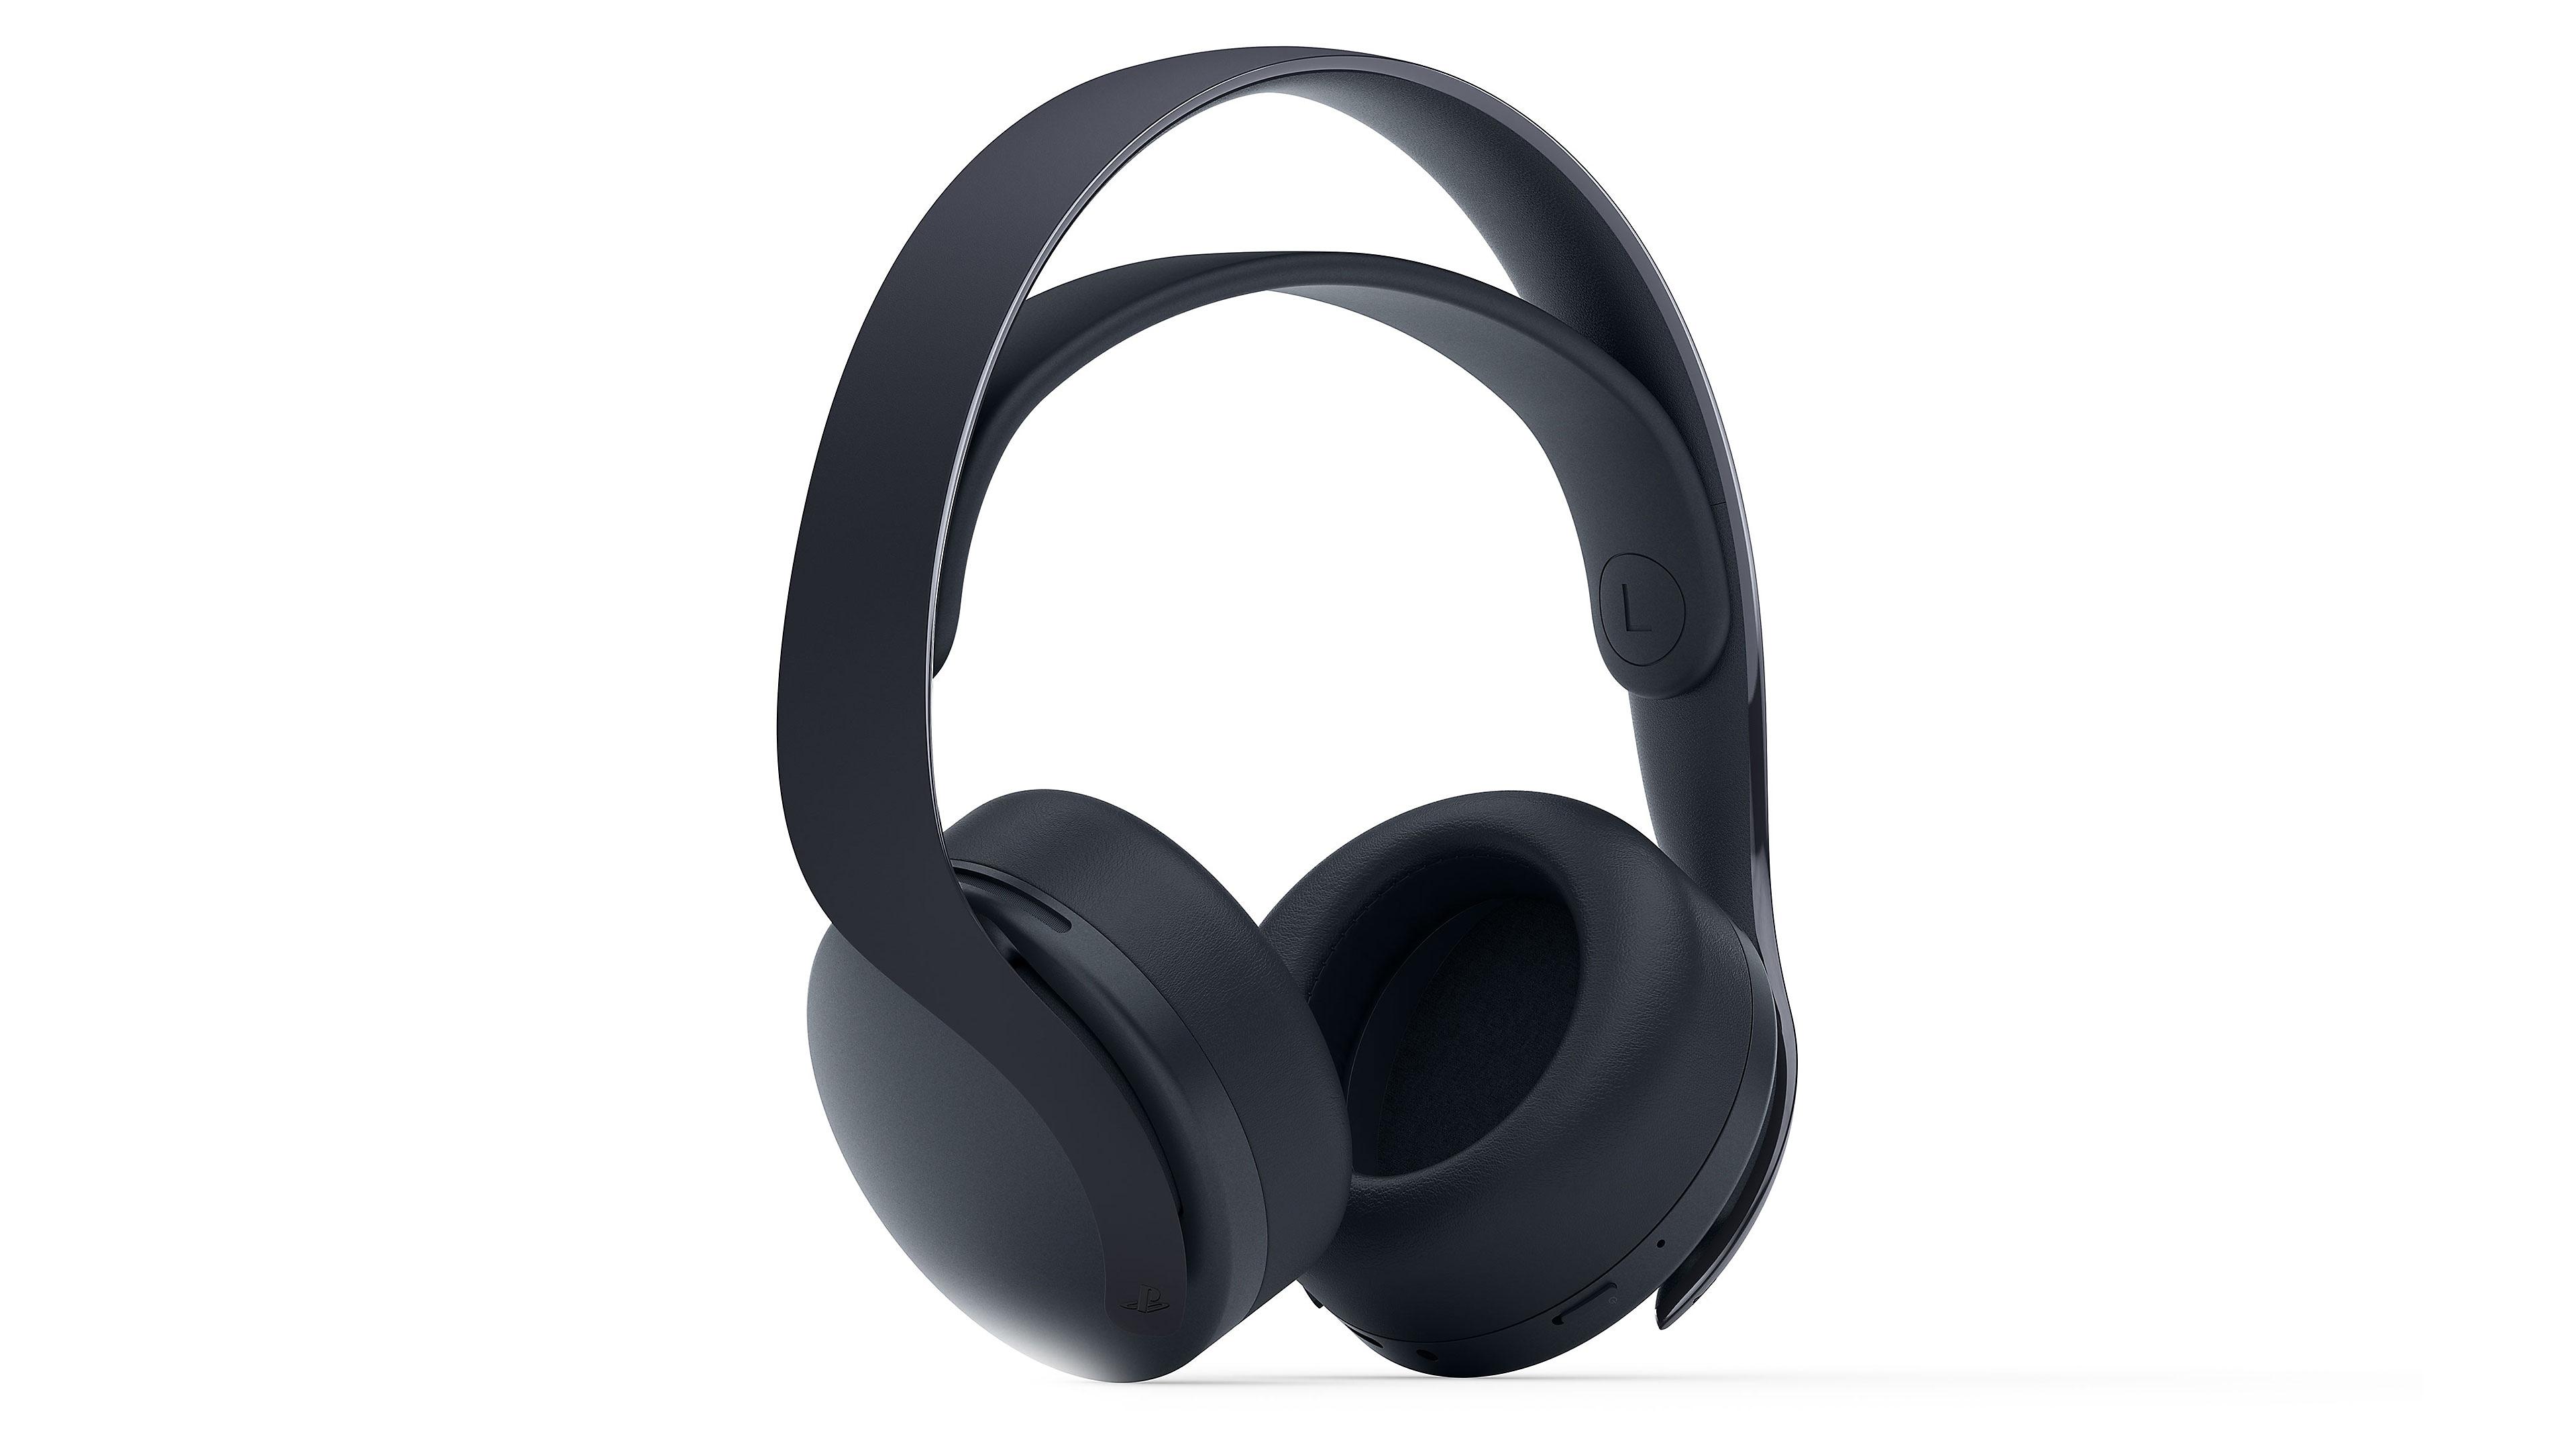 PULSE 3D Midnight Black wireless headset